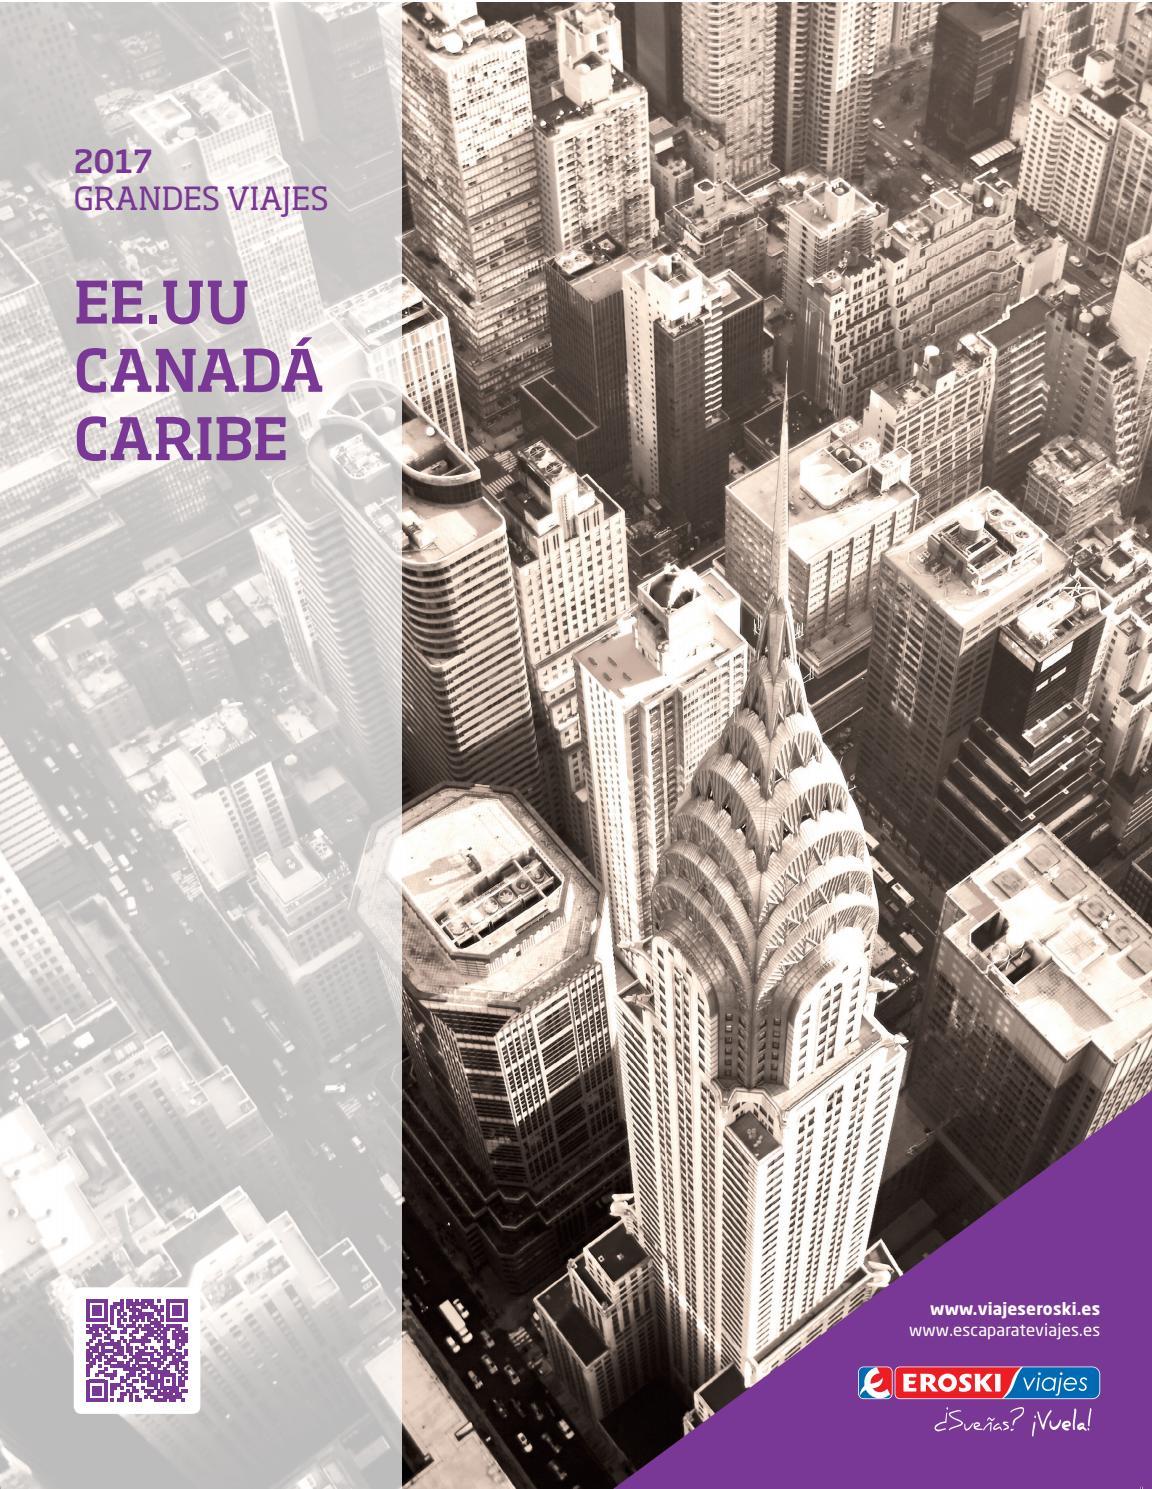 Catalogo EE.UU, Canadá y Caribe by Viajes Eroski - issuu